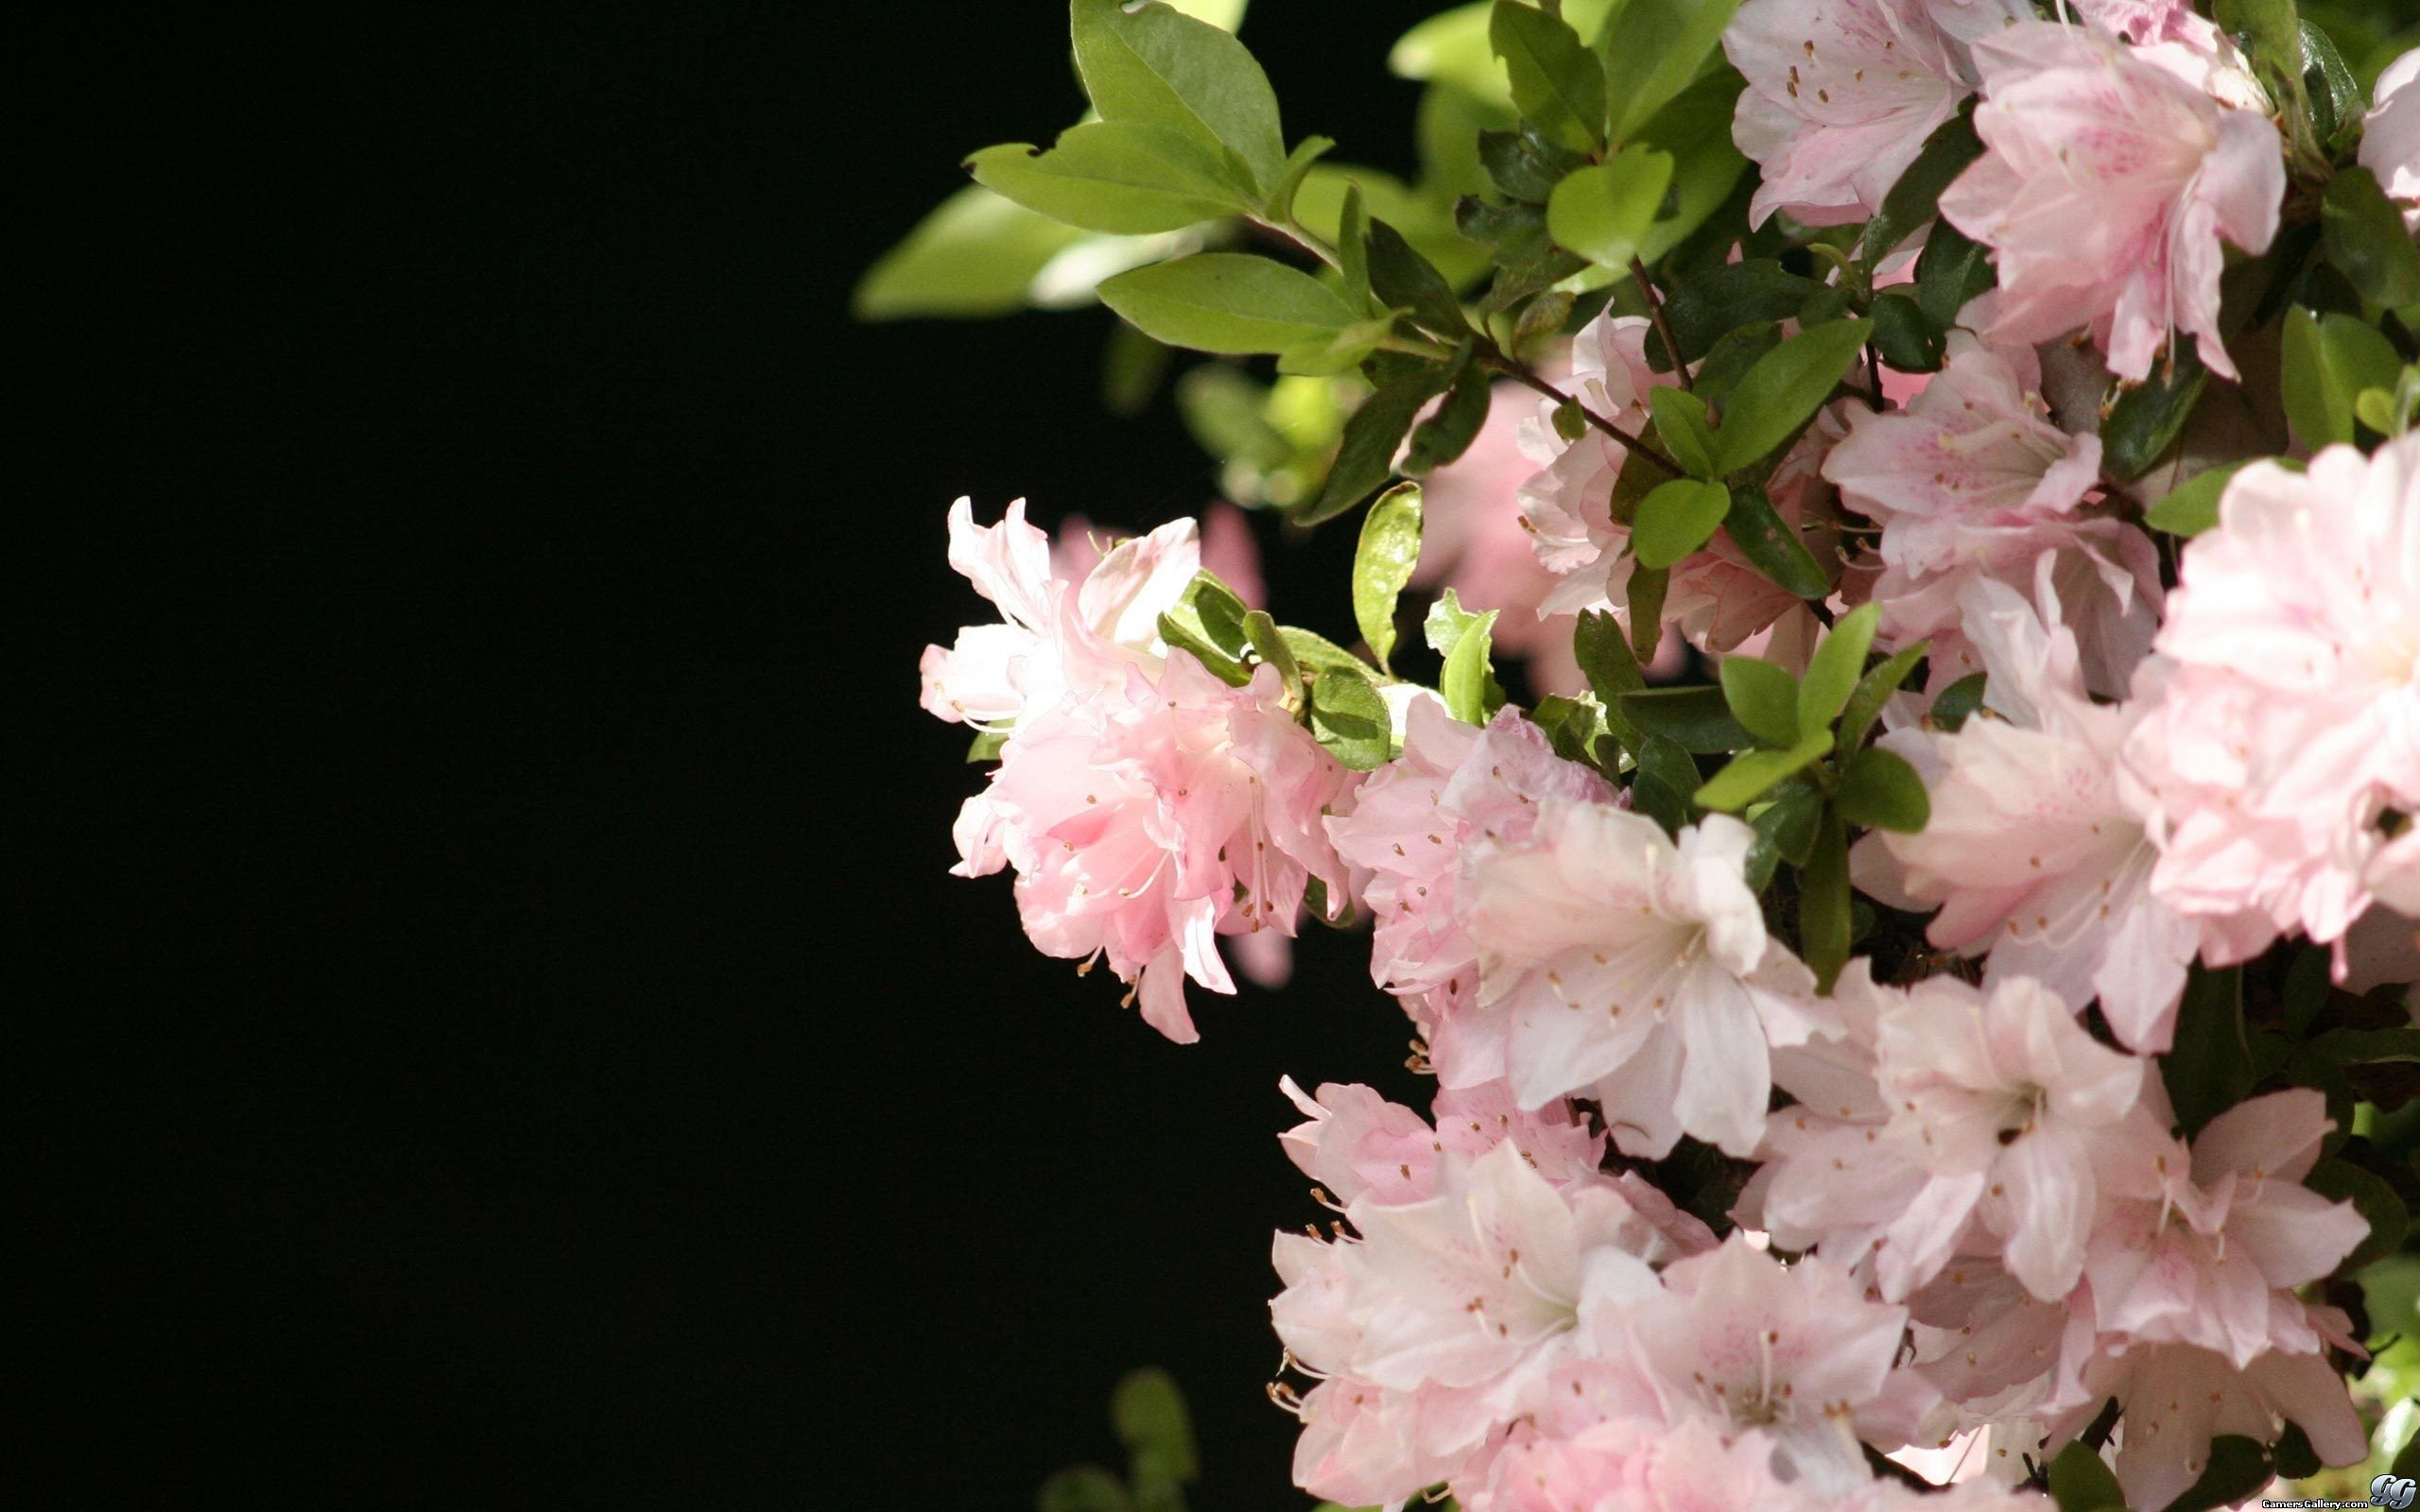 Cool Jasmine Flowers Awesome Pics Pinterest Beautiful Flowers